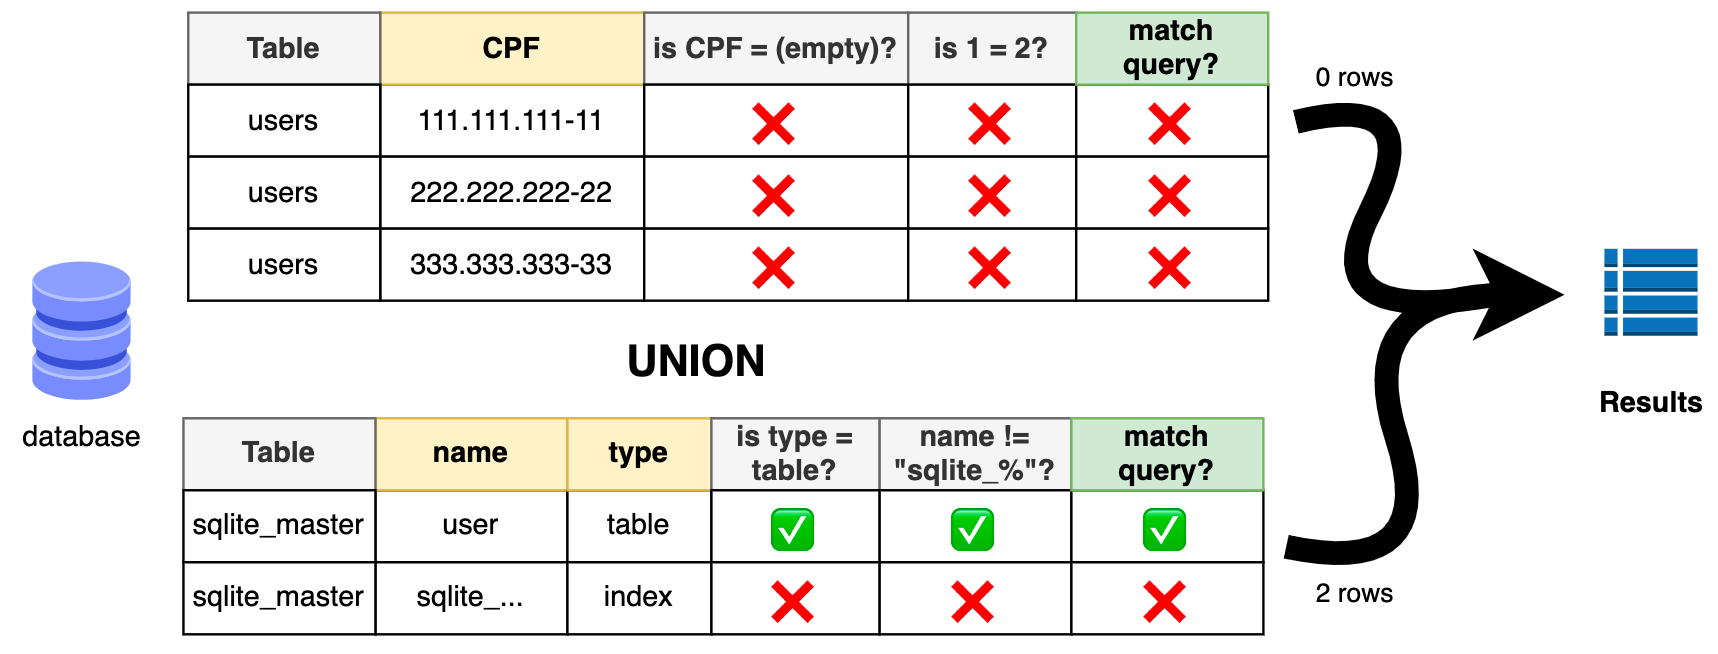 union clause